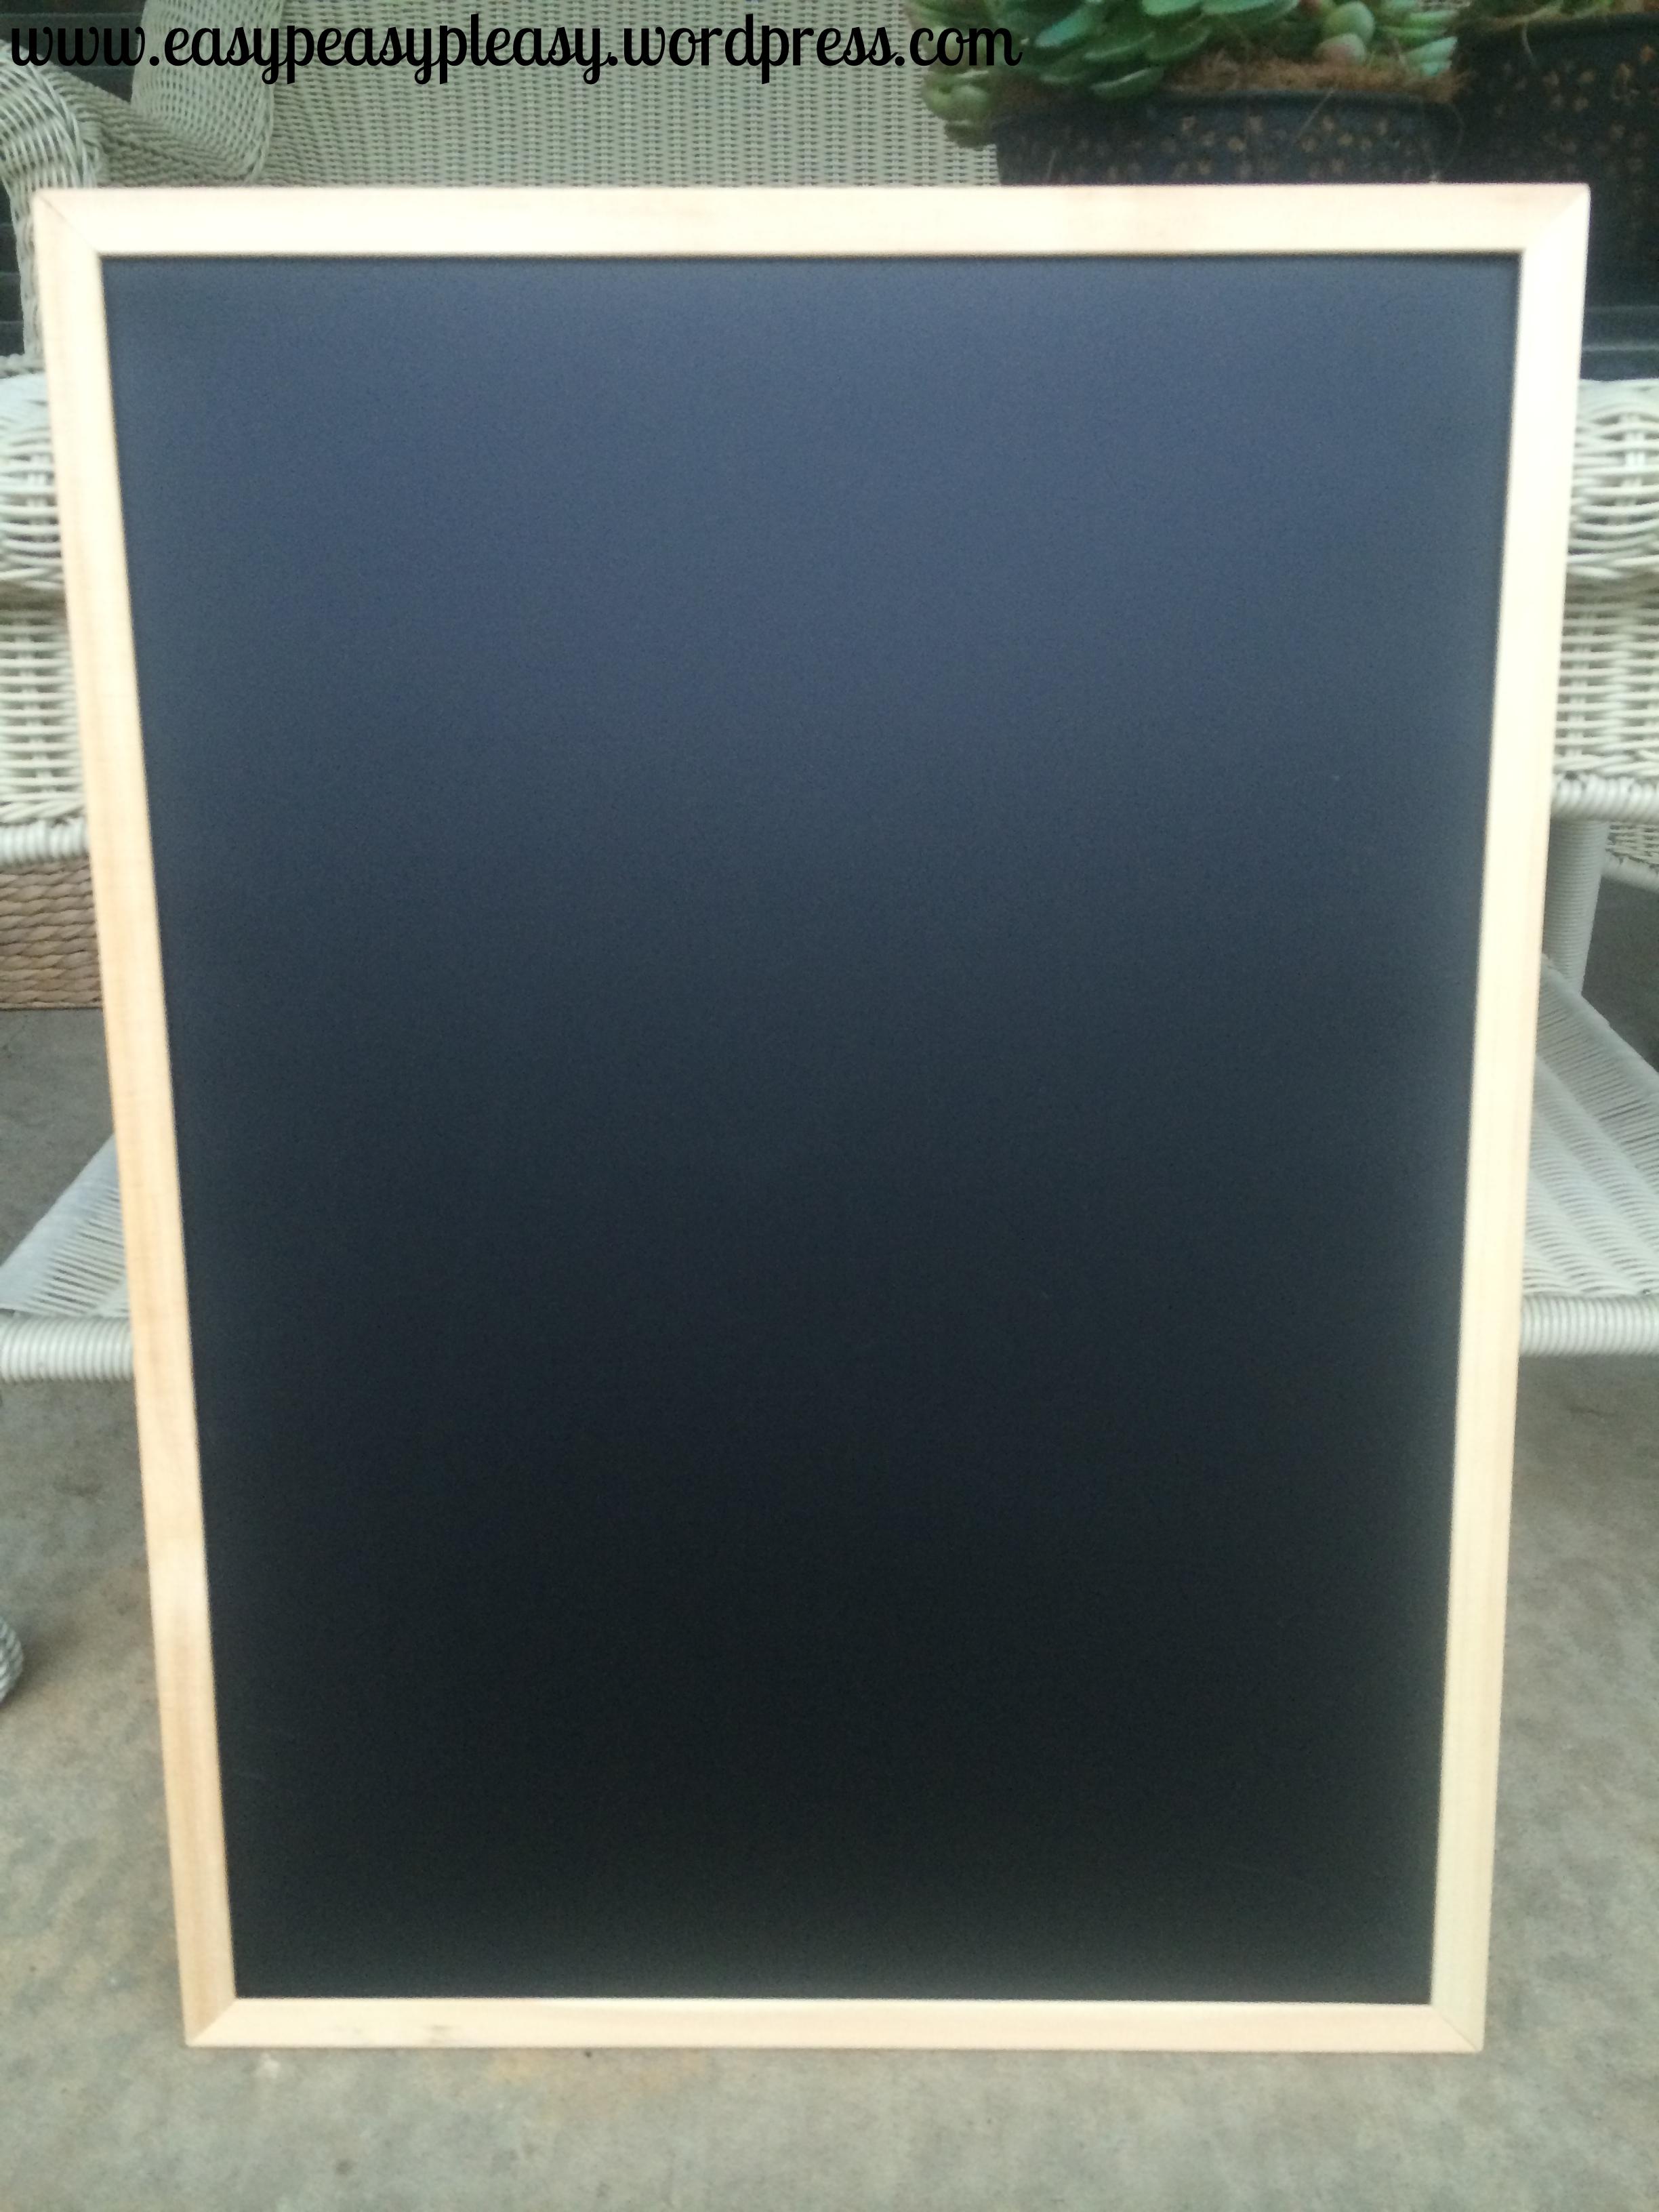 Chalkboard for birth announcement